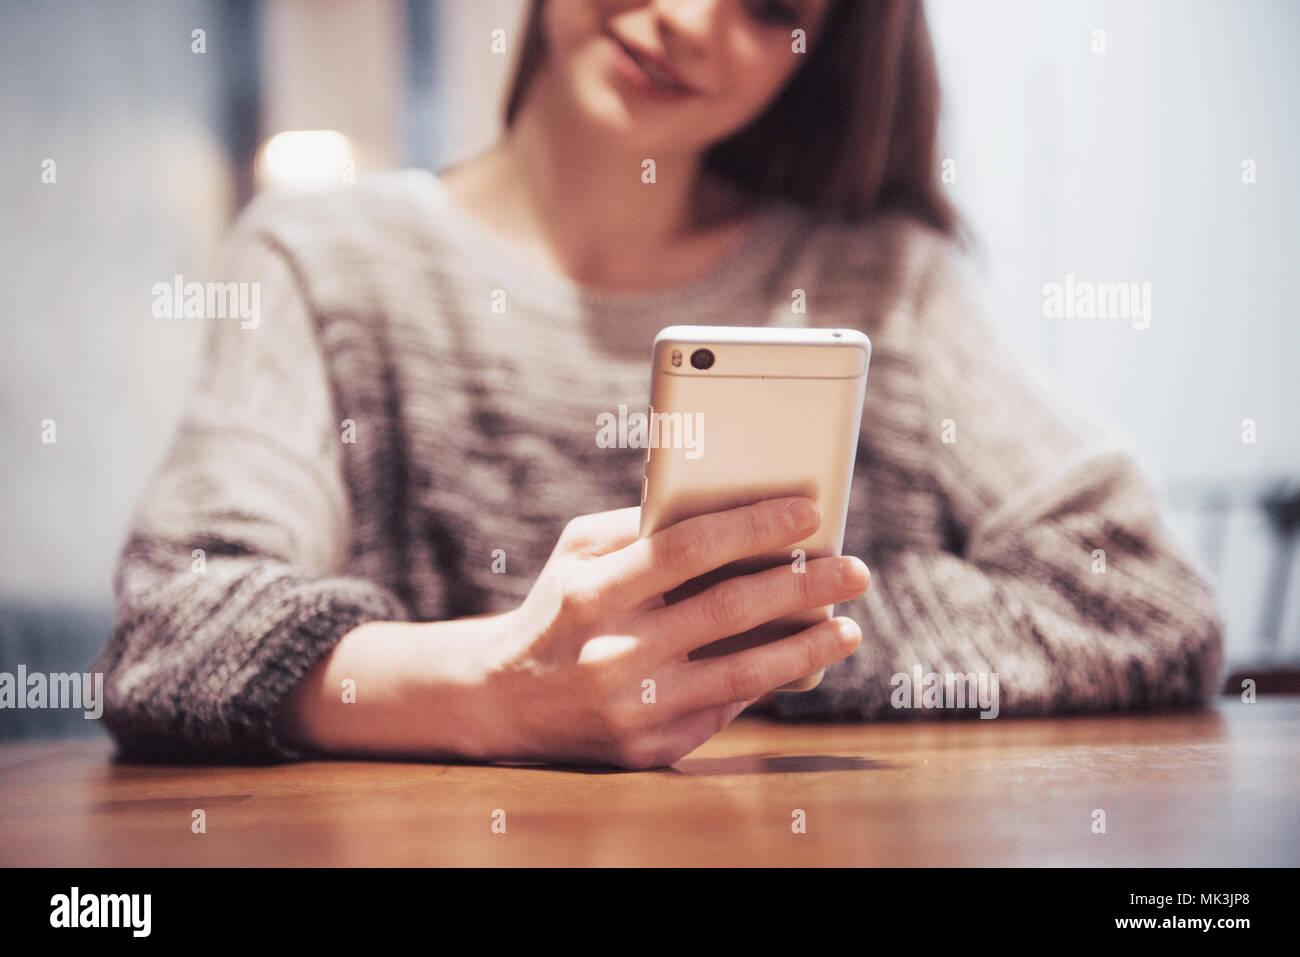 Schöne Brünette mit Laptop im Café. Blogger-Work-Konzept Stockbild